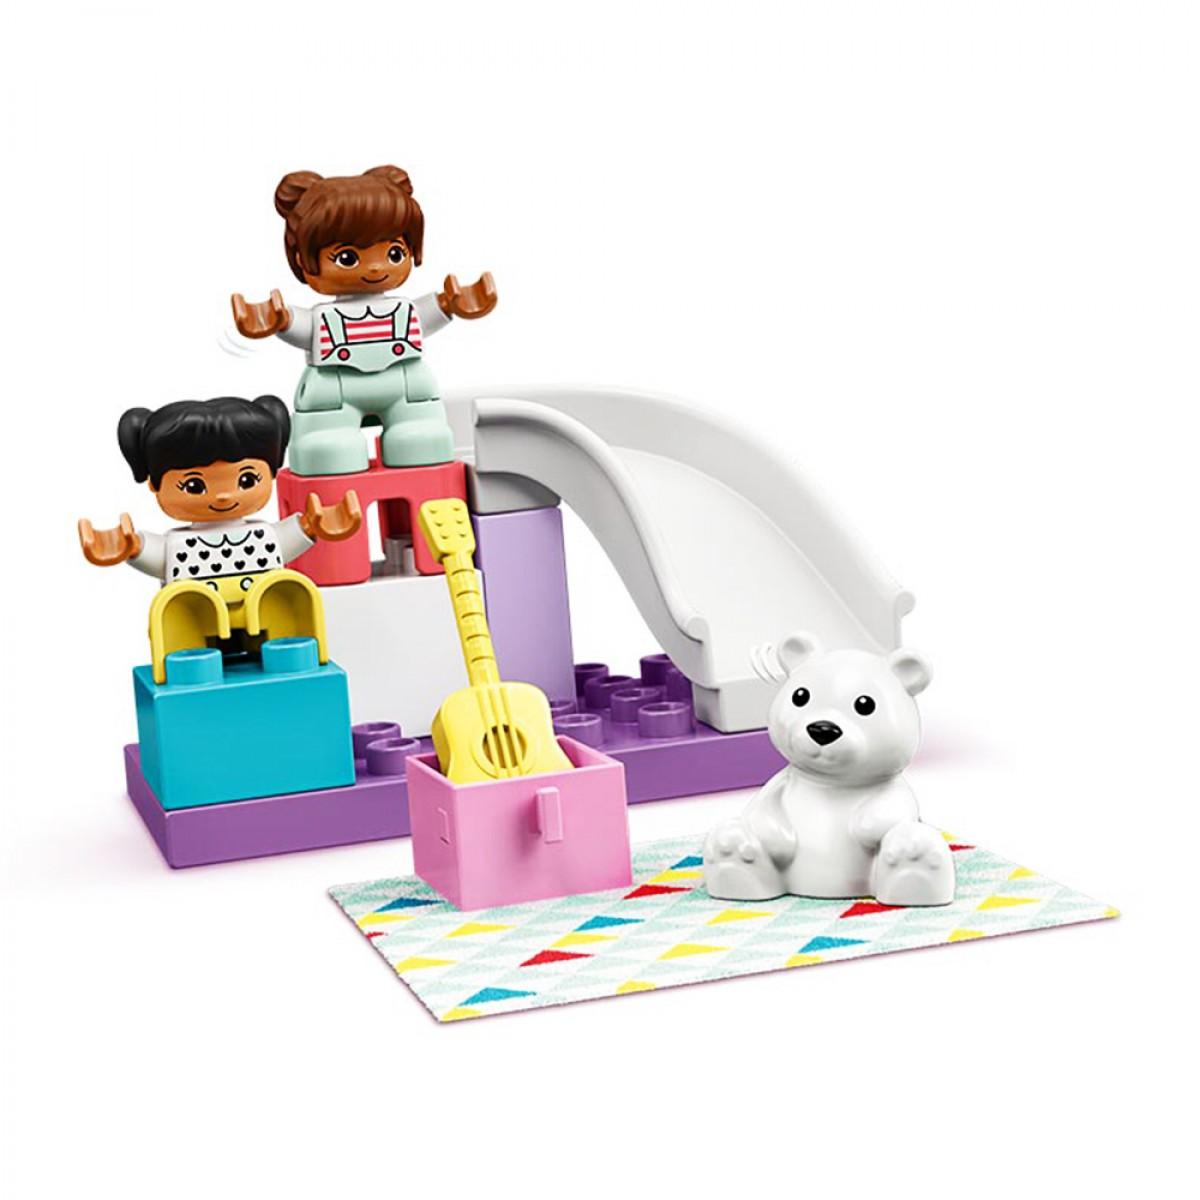 LEGO BEDROOM 10926